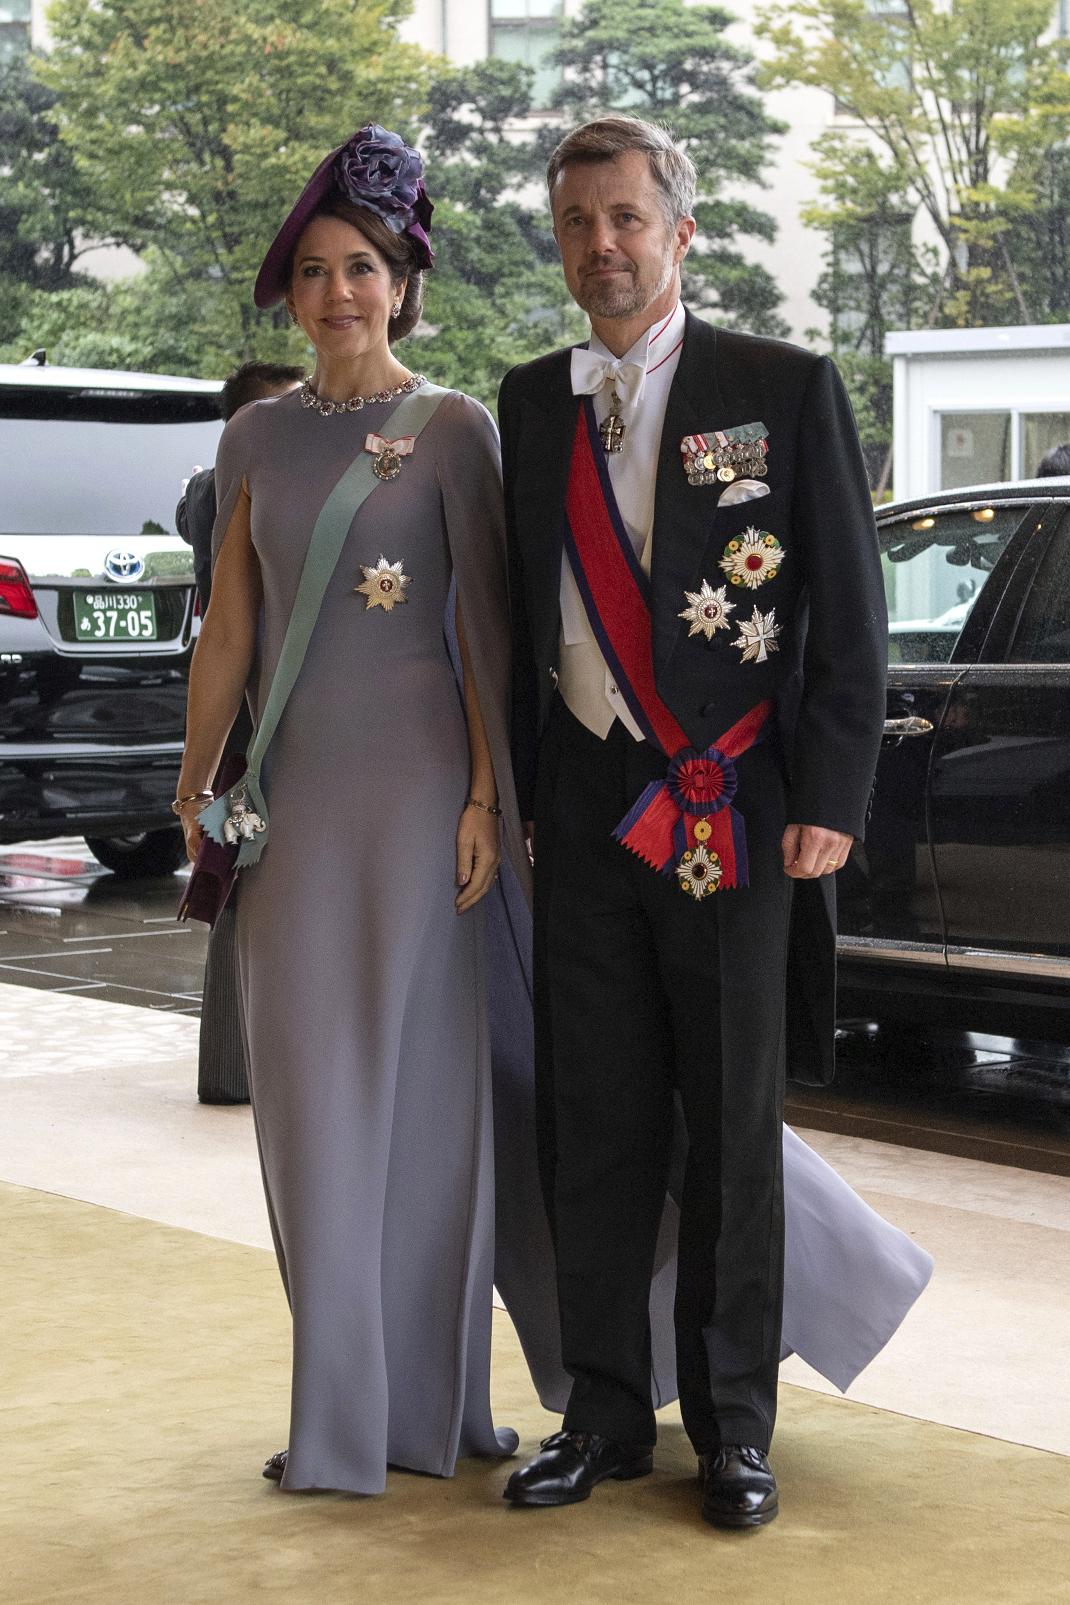 H πριγκίπισσα Μαίρη της Δανίας πάει στην ενθρόνιση του Ναρουχίτο